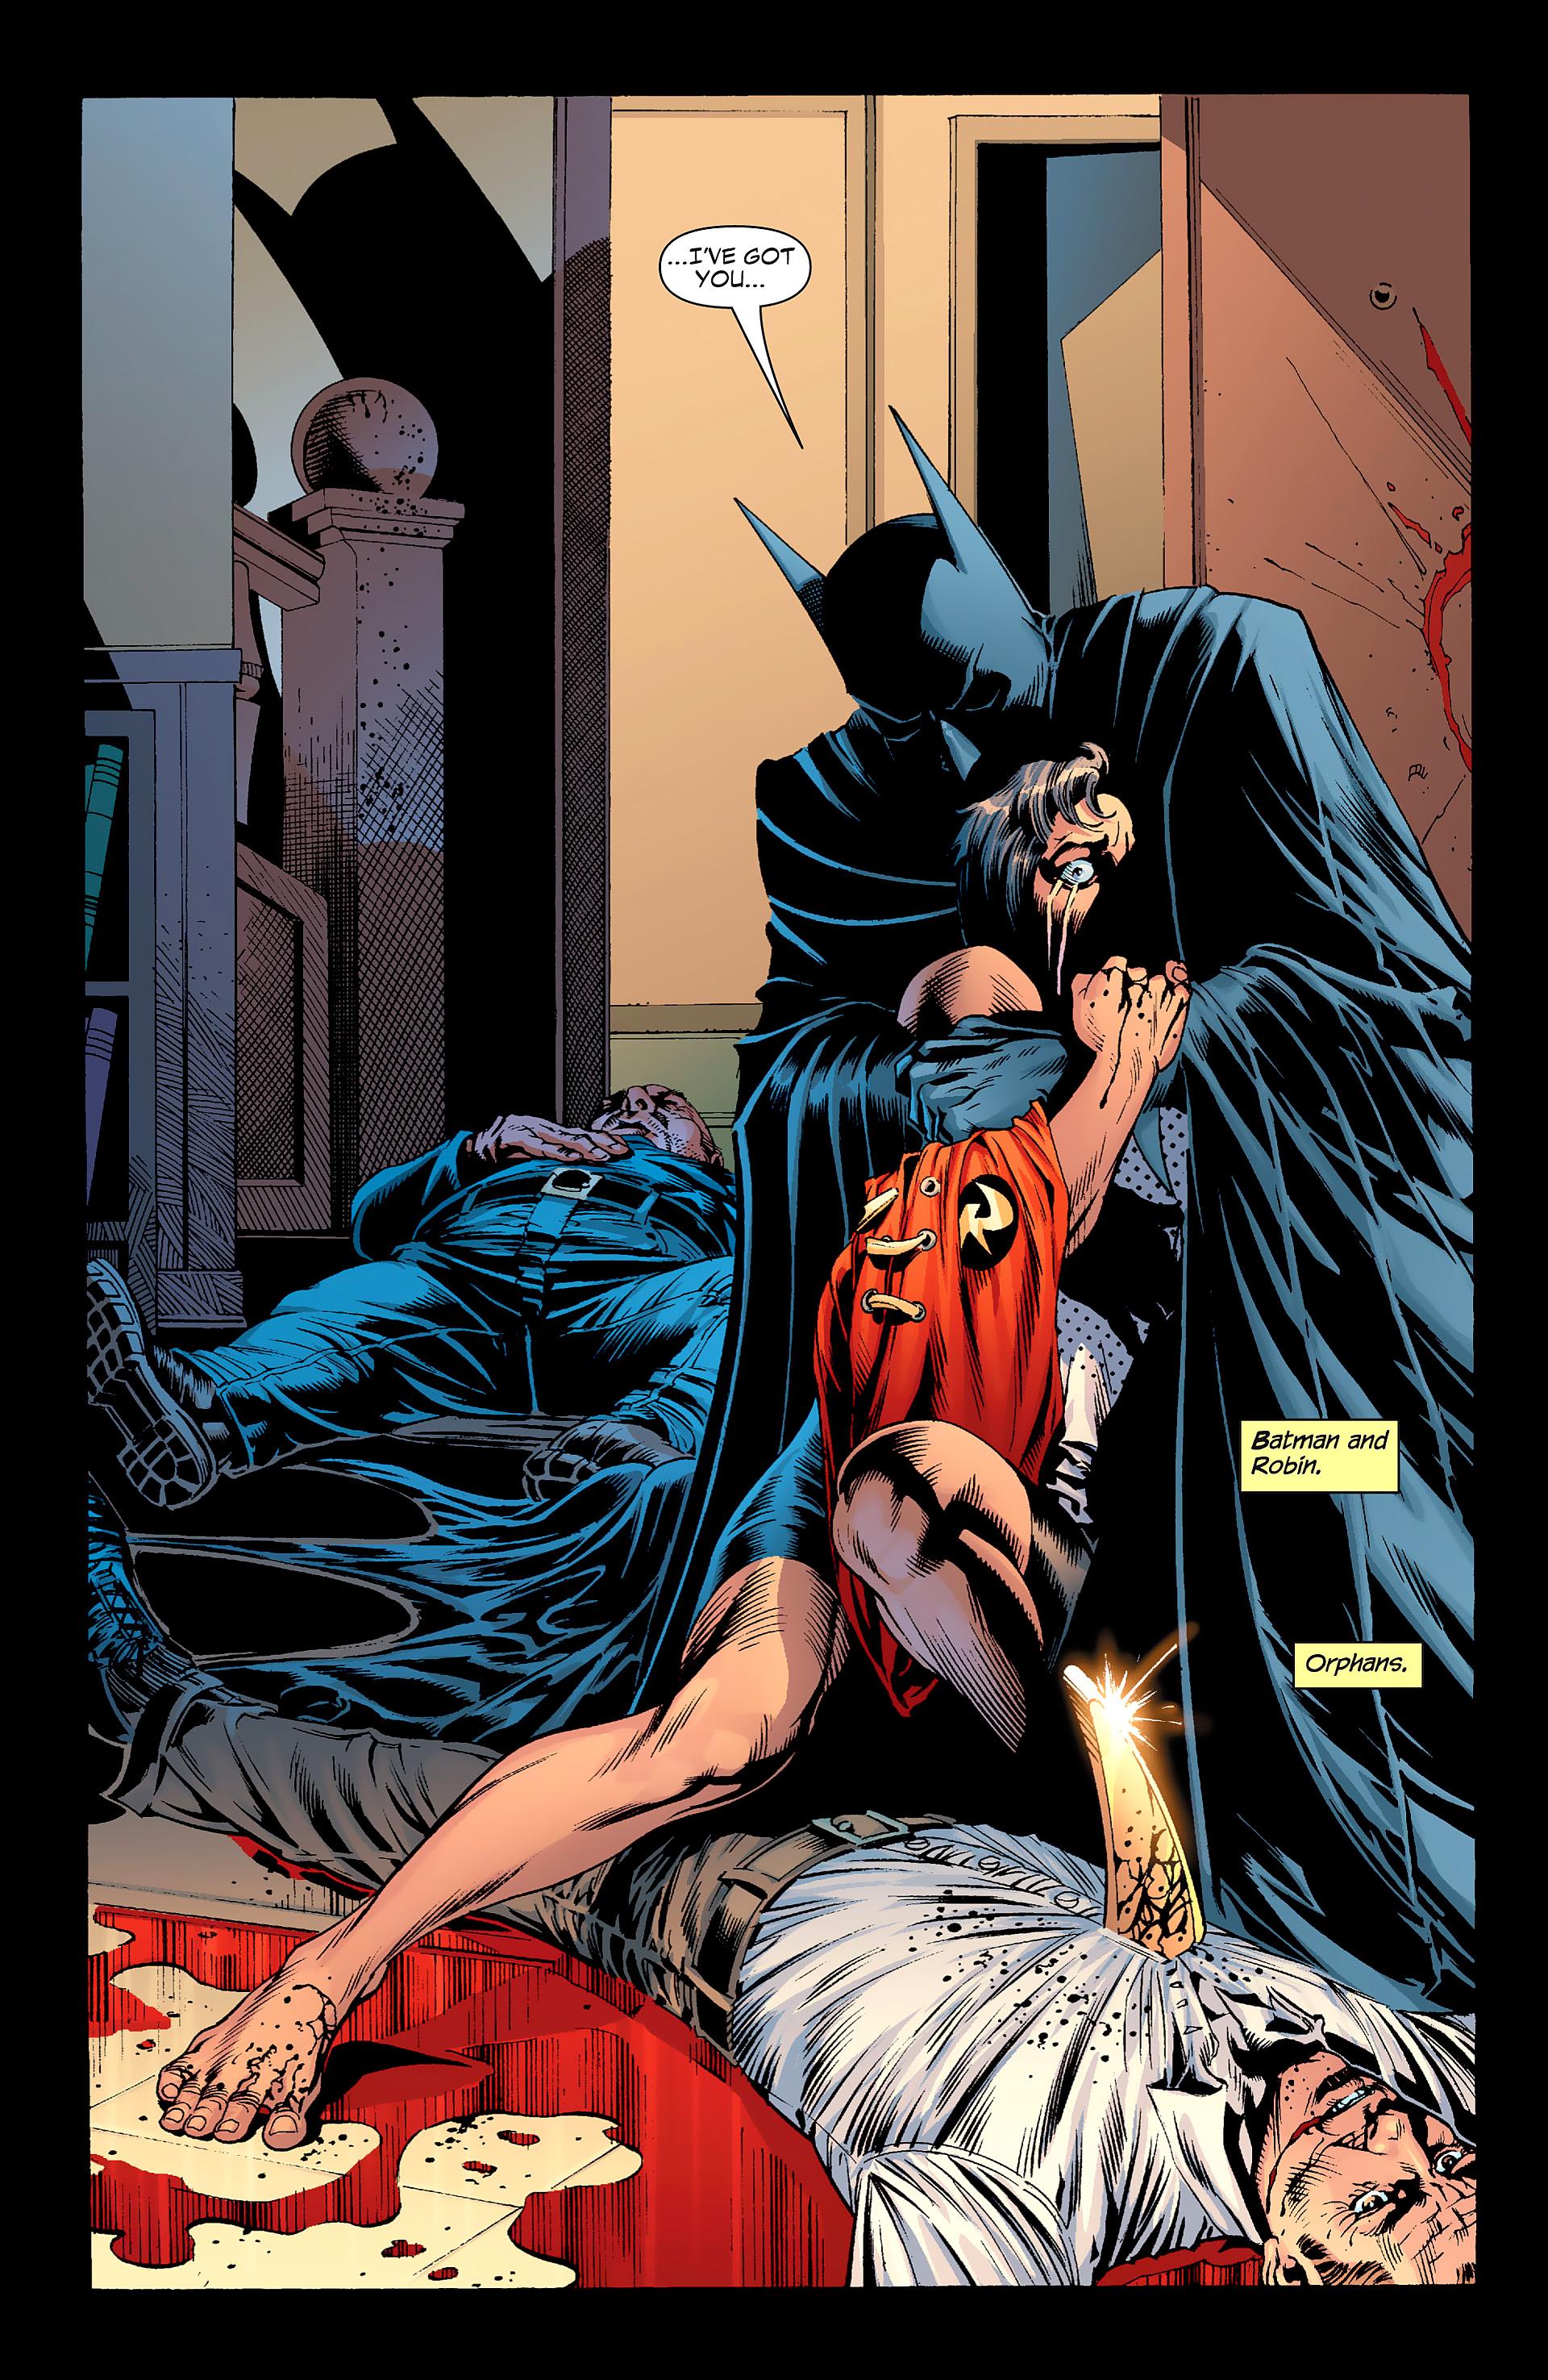 Psychology of Bruce Wayne BWa_Nnaa_rDQpHNlPW1nQs5iSO2noxRt-kAU8Jnkd2i_xnd__rfChWLwZyURYgETUWyHFfwYuiQQ=s0